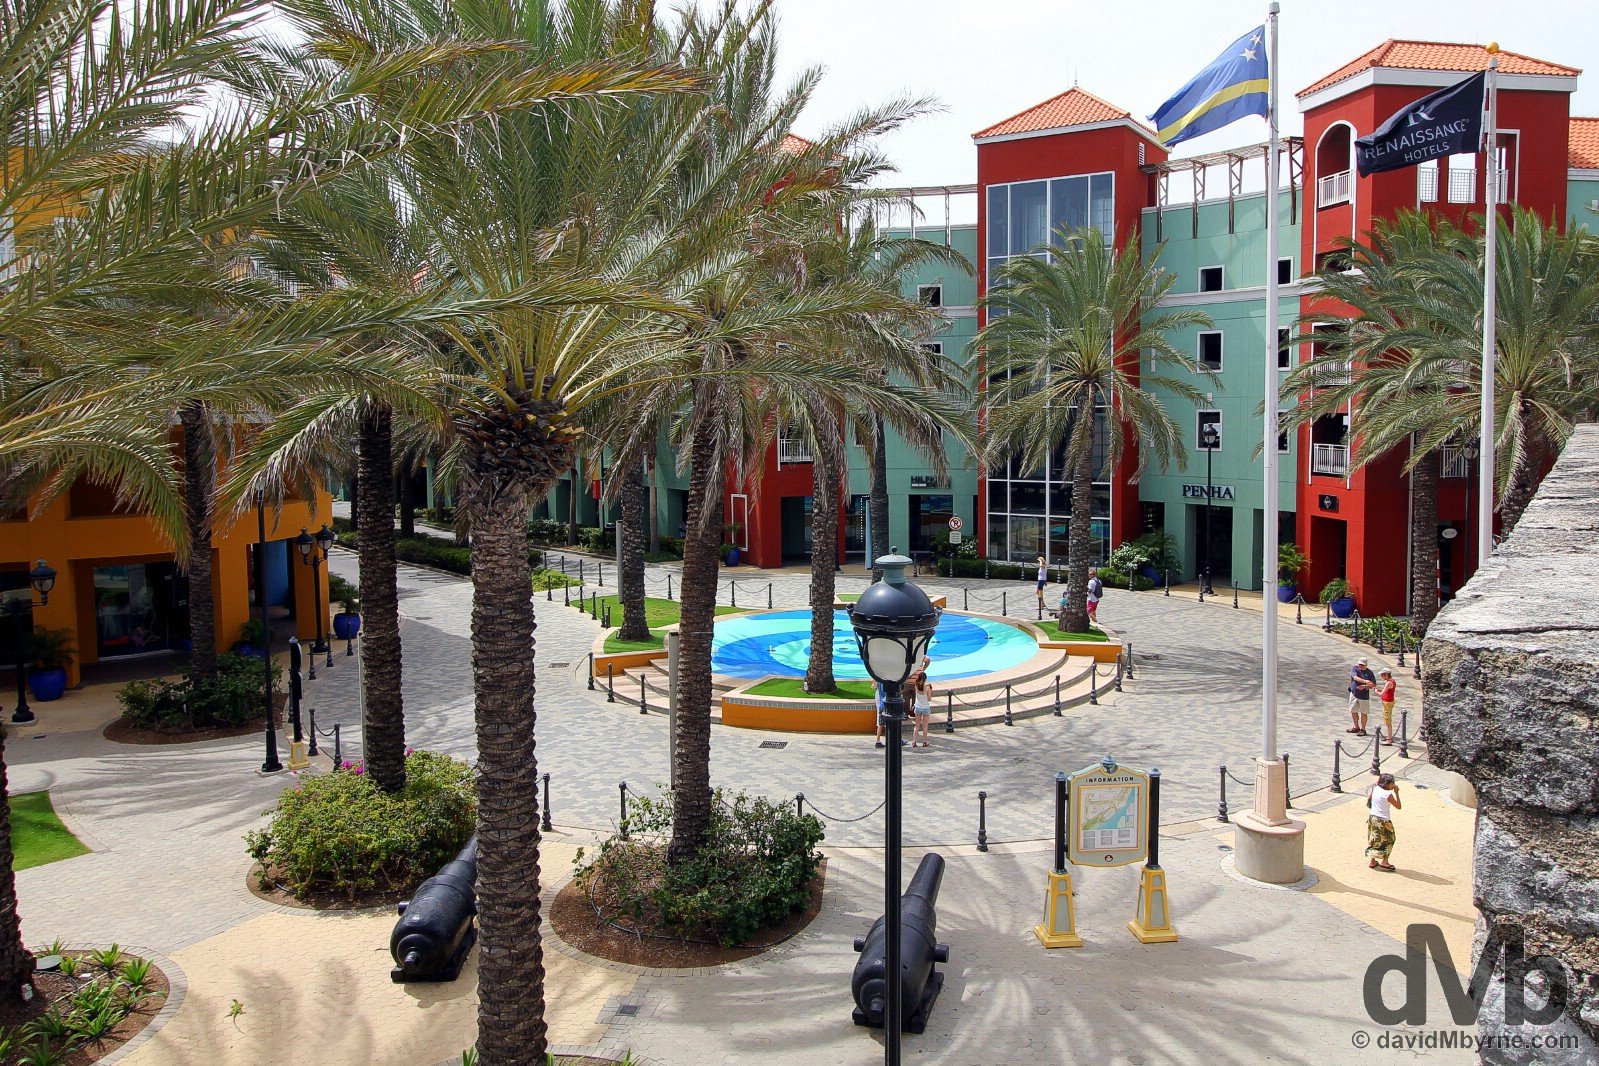 Renaissance Resort & Shopping Mall as seen from the walls of Rif Fort, Willemstad, Curacao, Lesser Antilles. June 19, 2015.